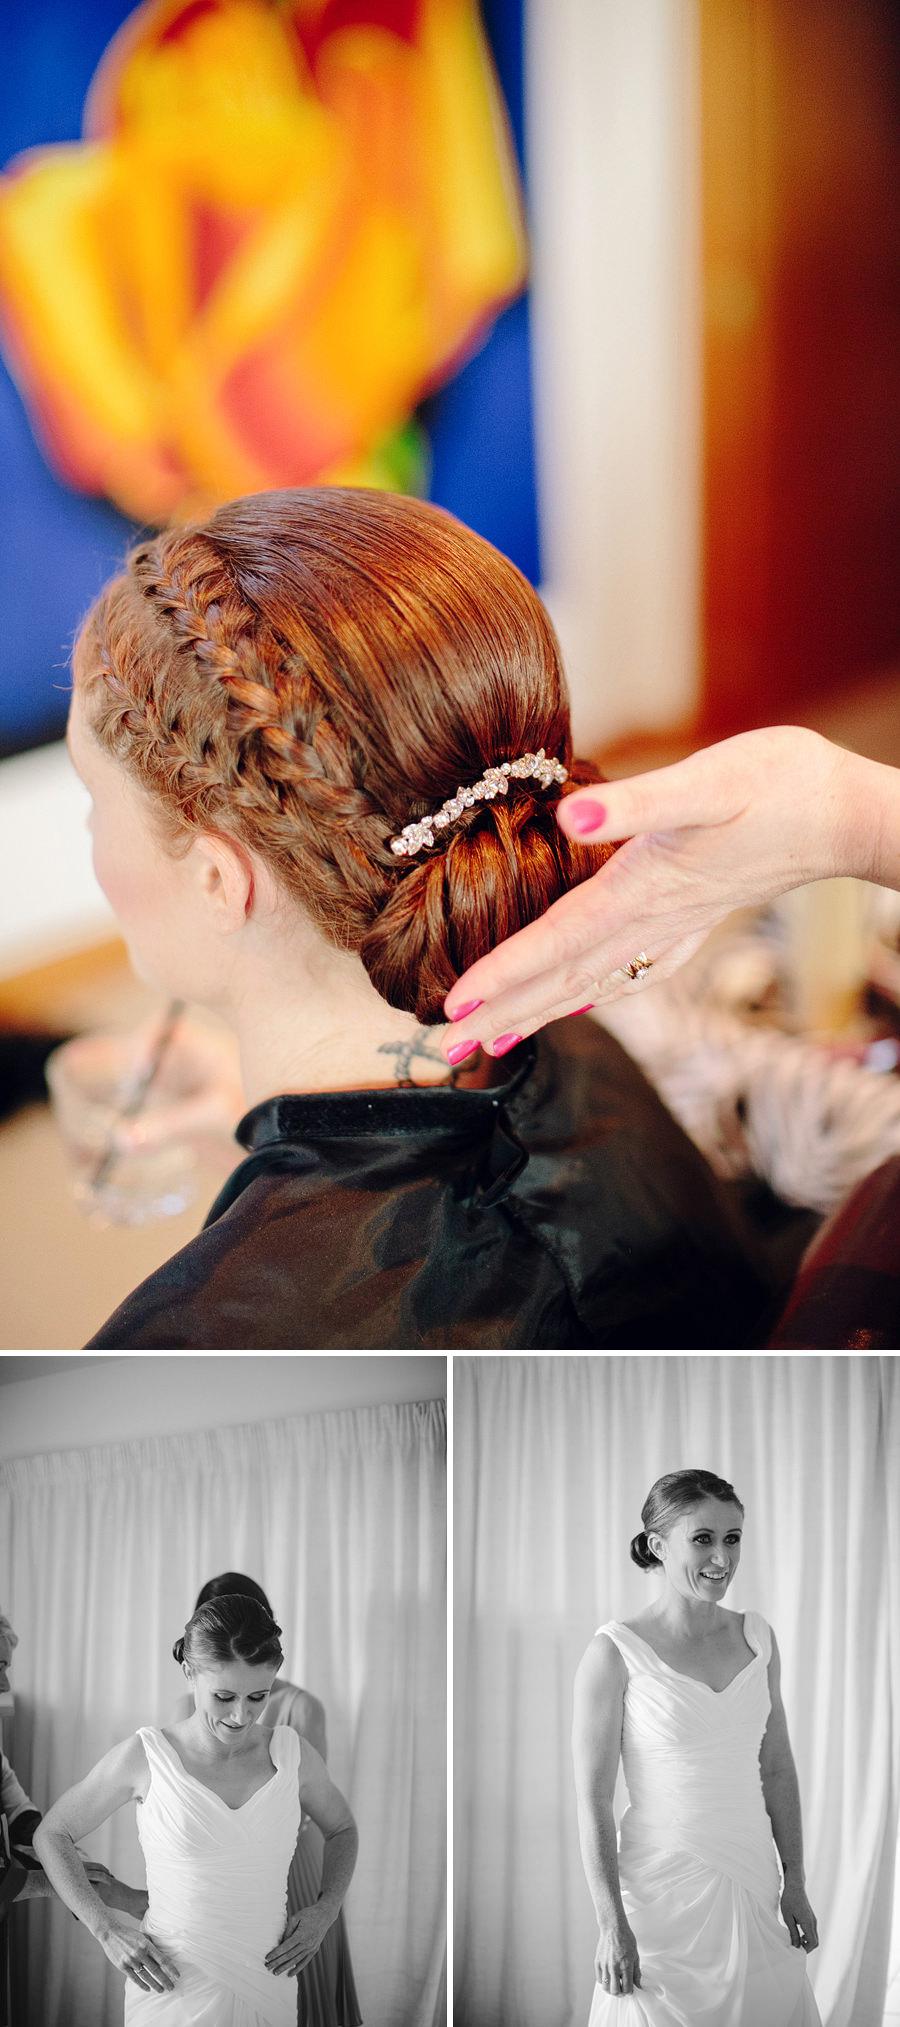 Winter Wedding Photographers: Bride getting ready